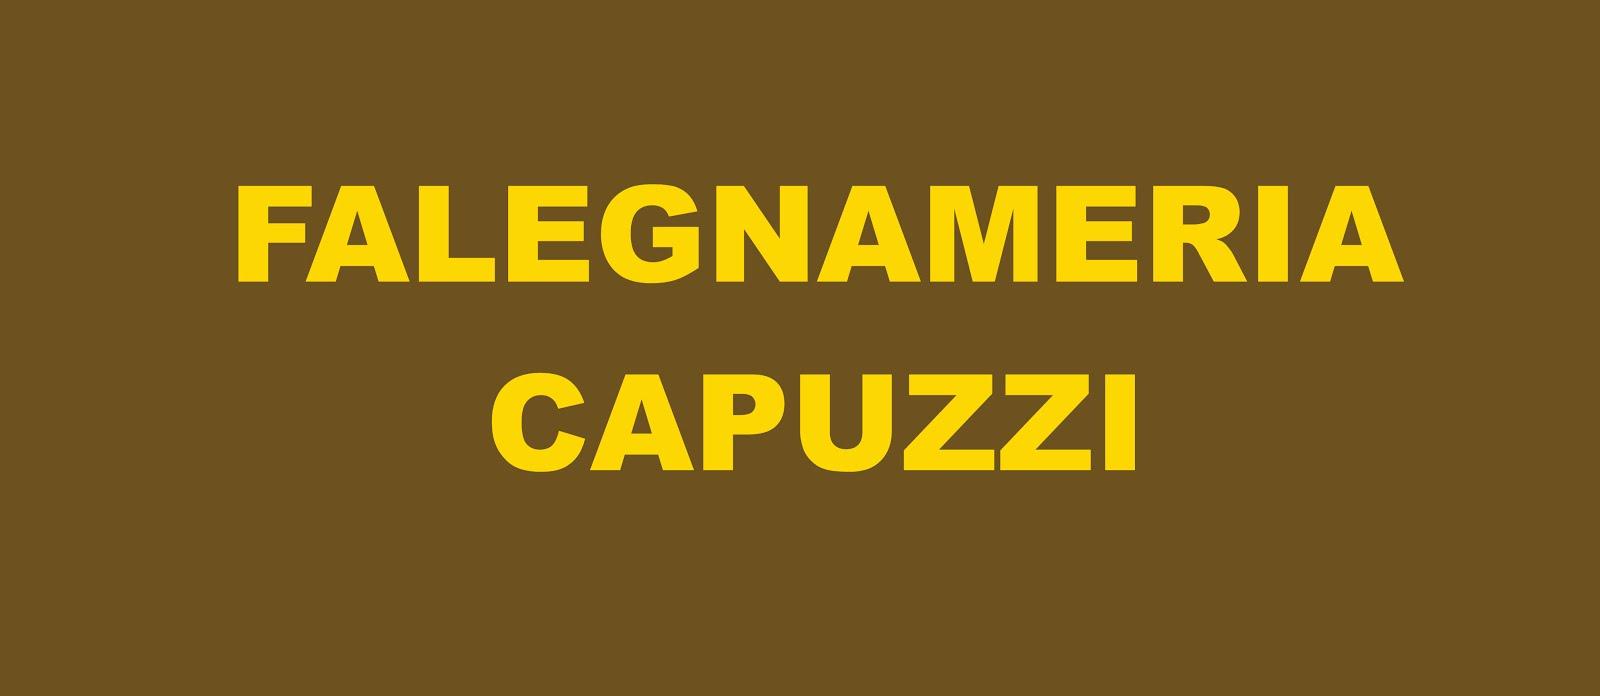 FALEGNAMERIA CAPUZZI